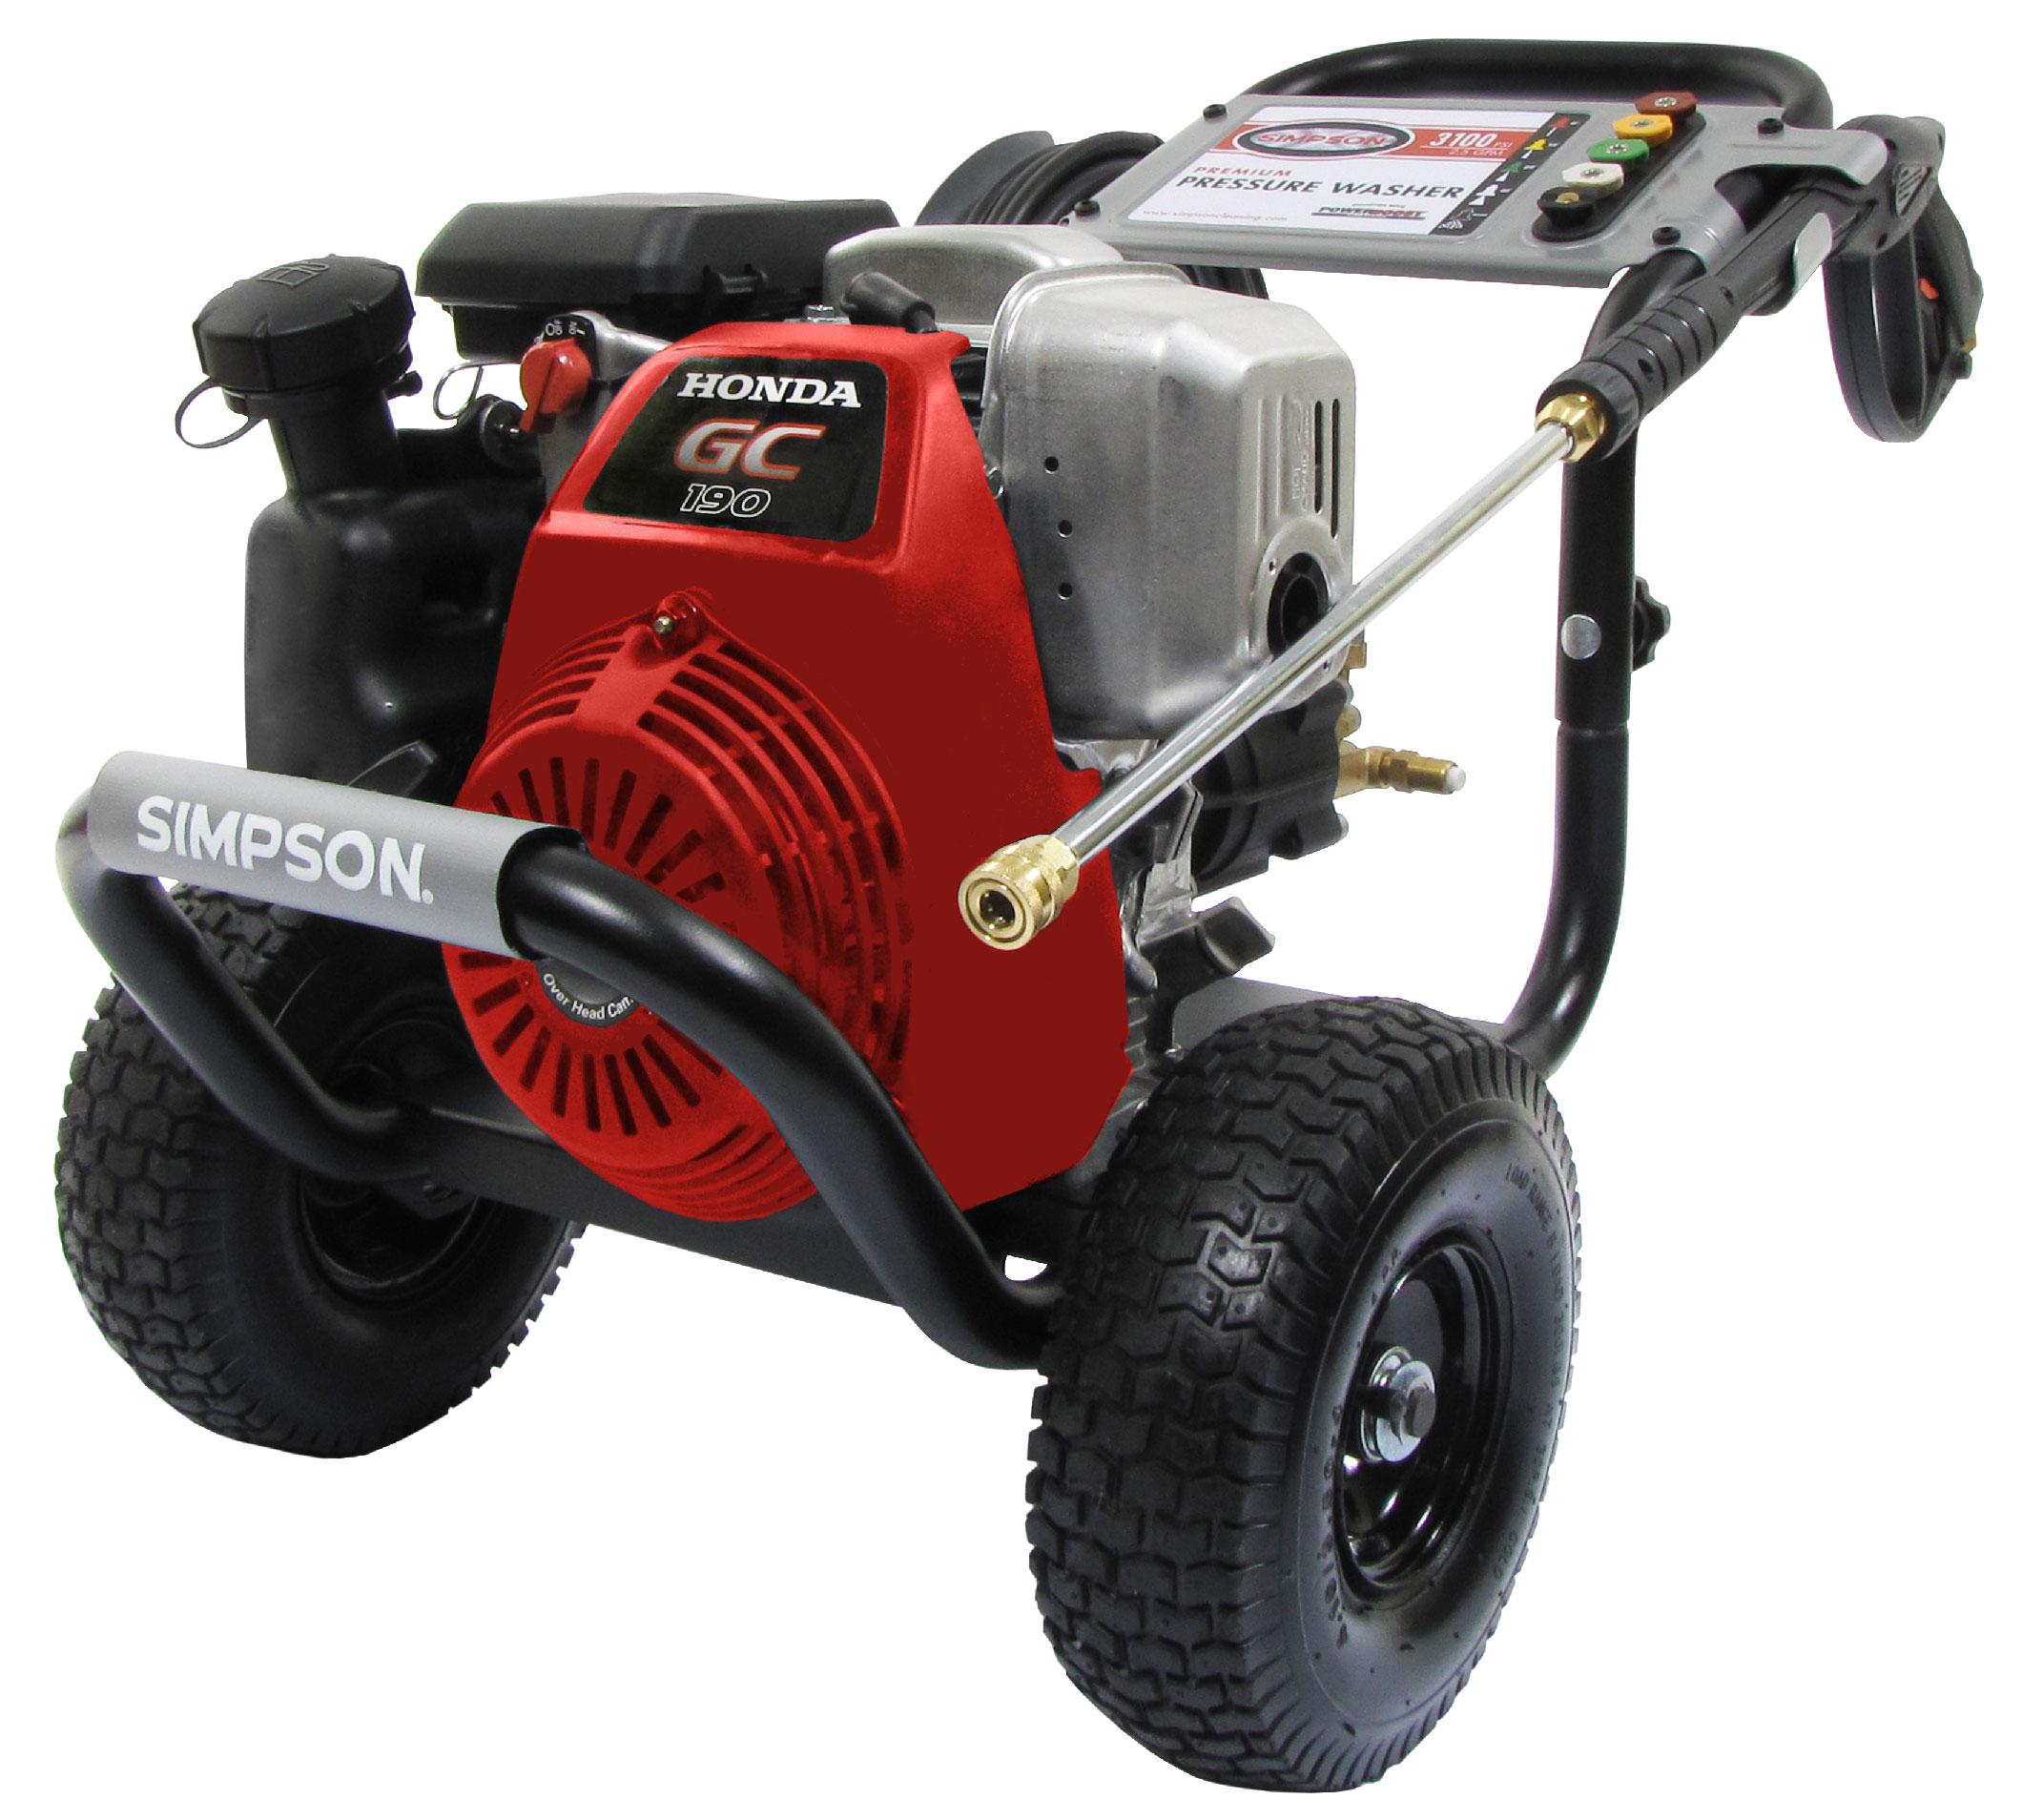 Simpson megashot 3100 psi 2 5 gpm honda gc190 engine gas for Power washer with honda motor